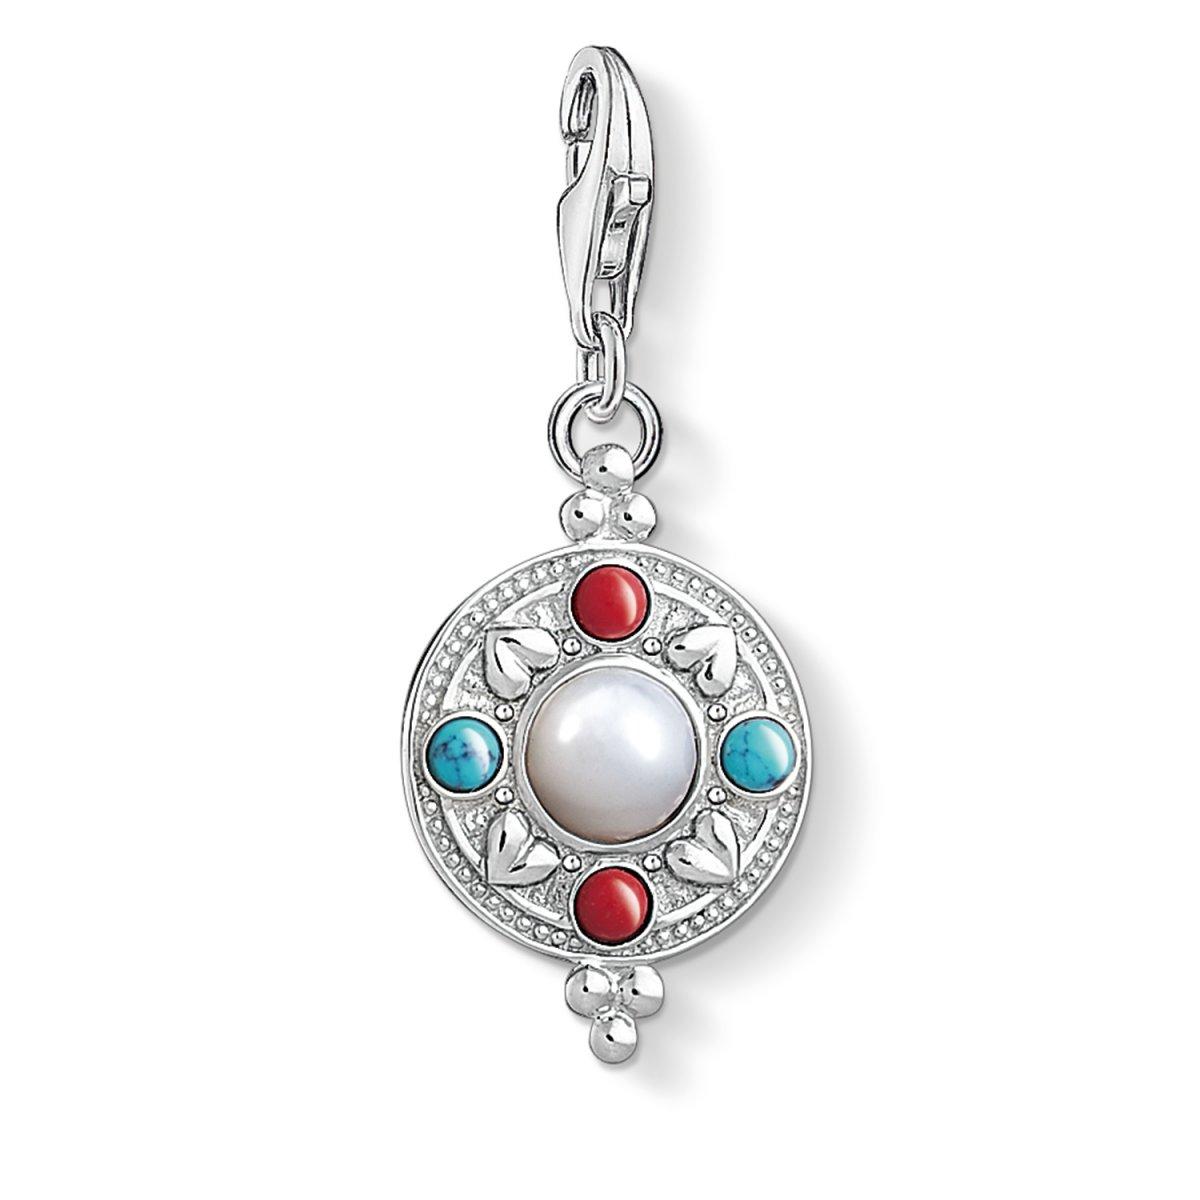 Prívesok THOMAS SABO s perlou